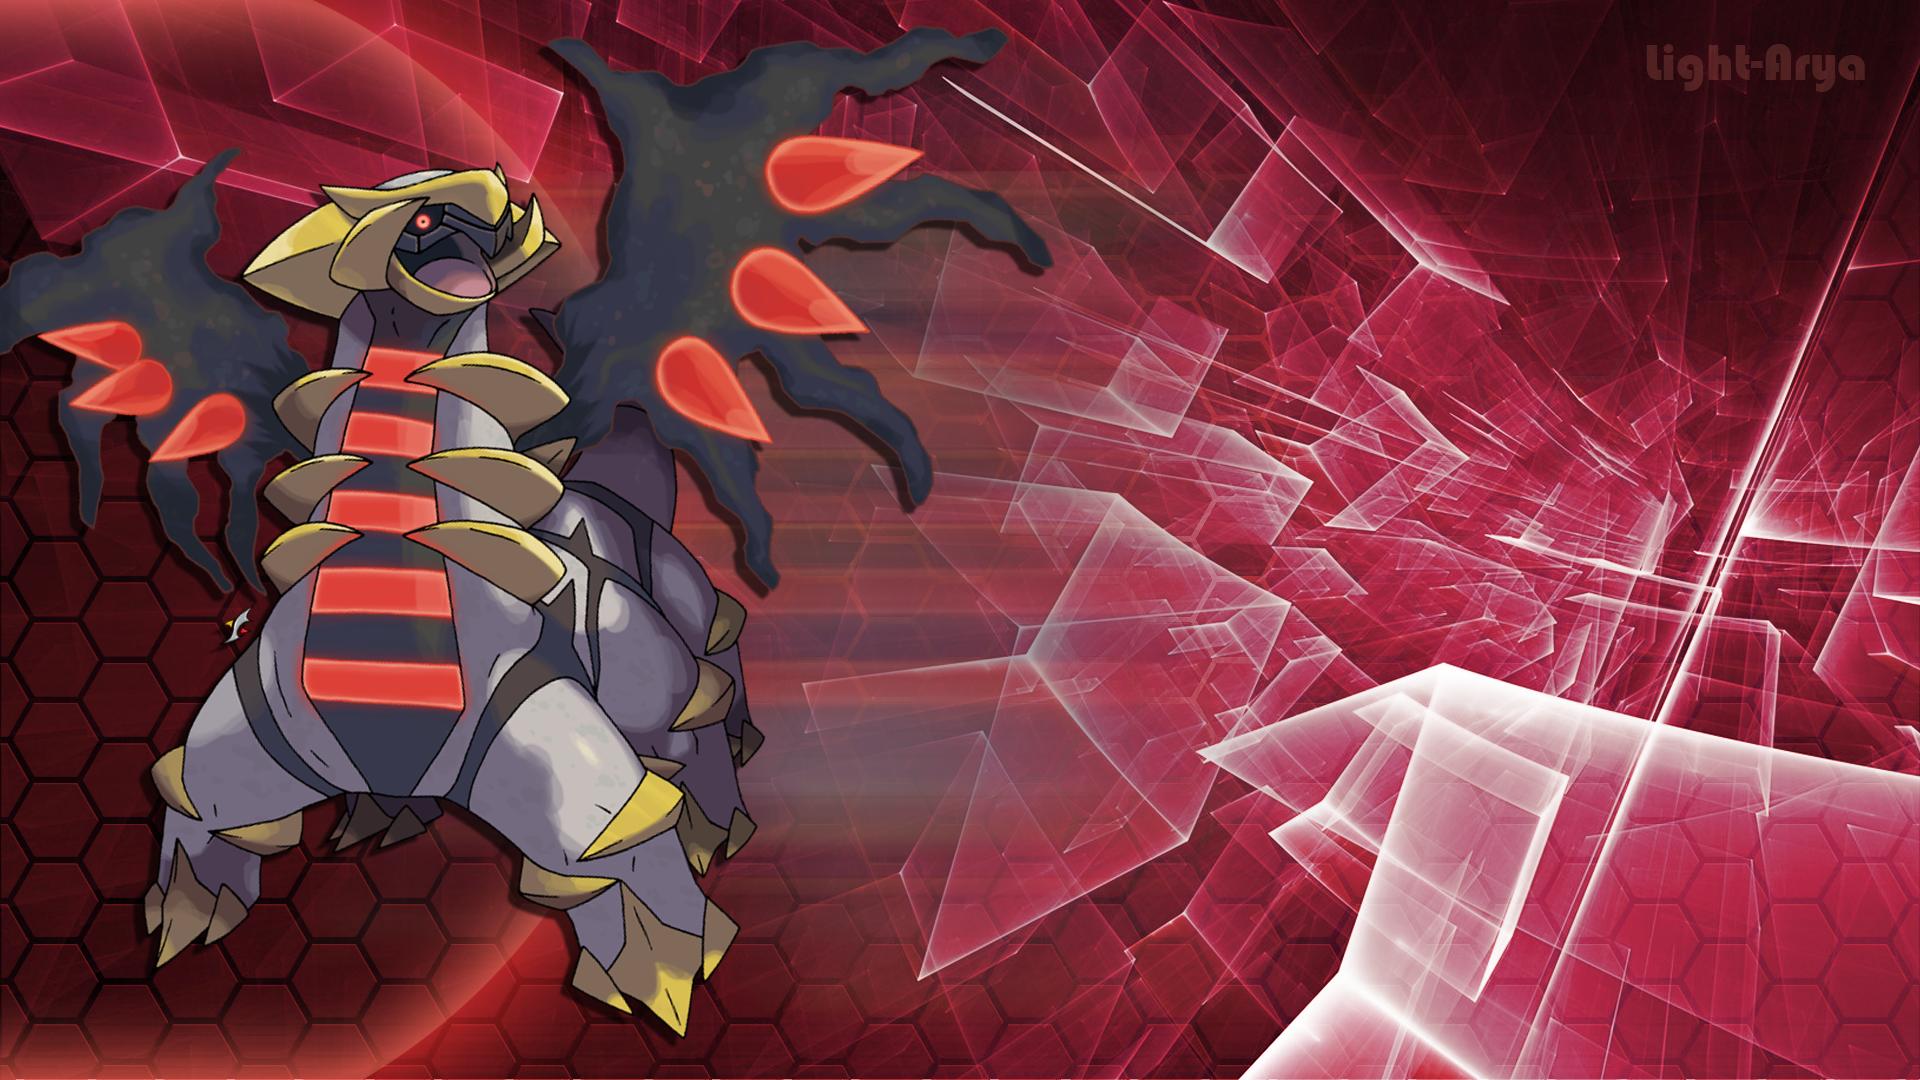 Giratina - Pokemon Platinum by Light-Arya on DeviantArt